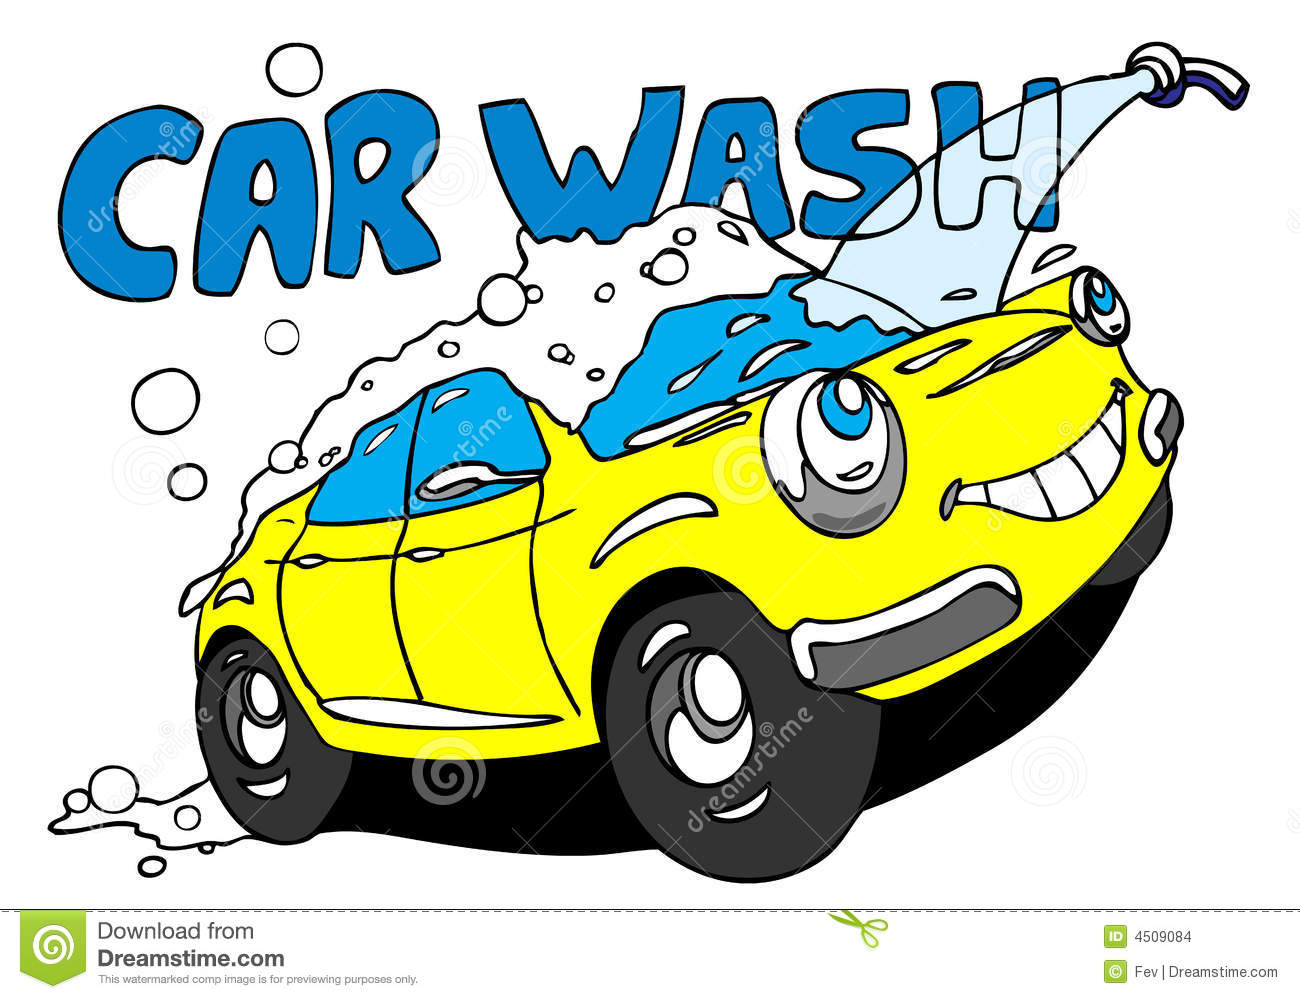 Car washing clipart.